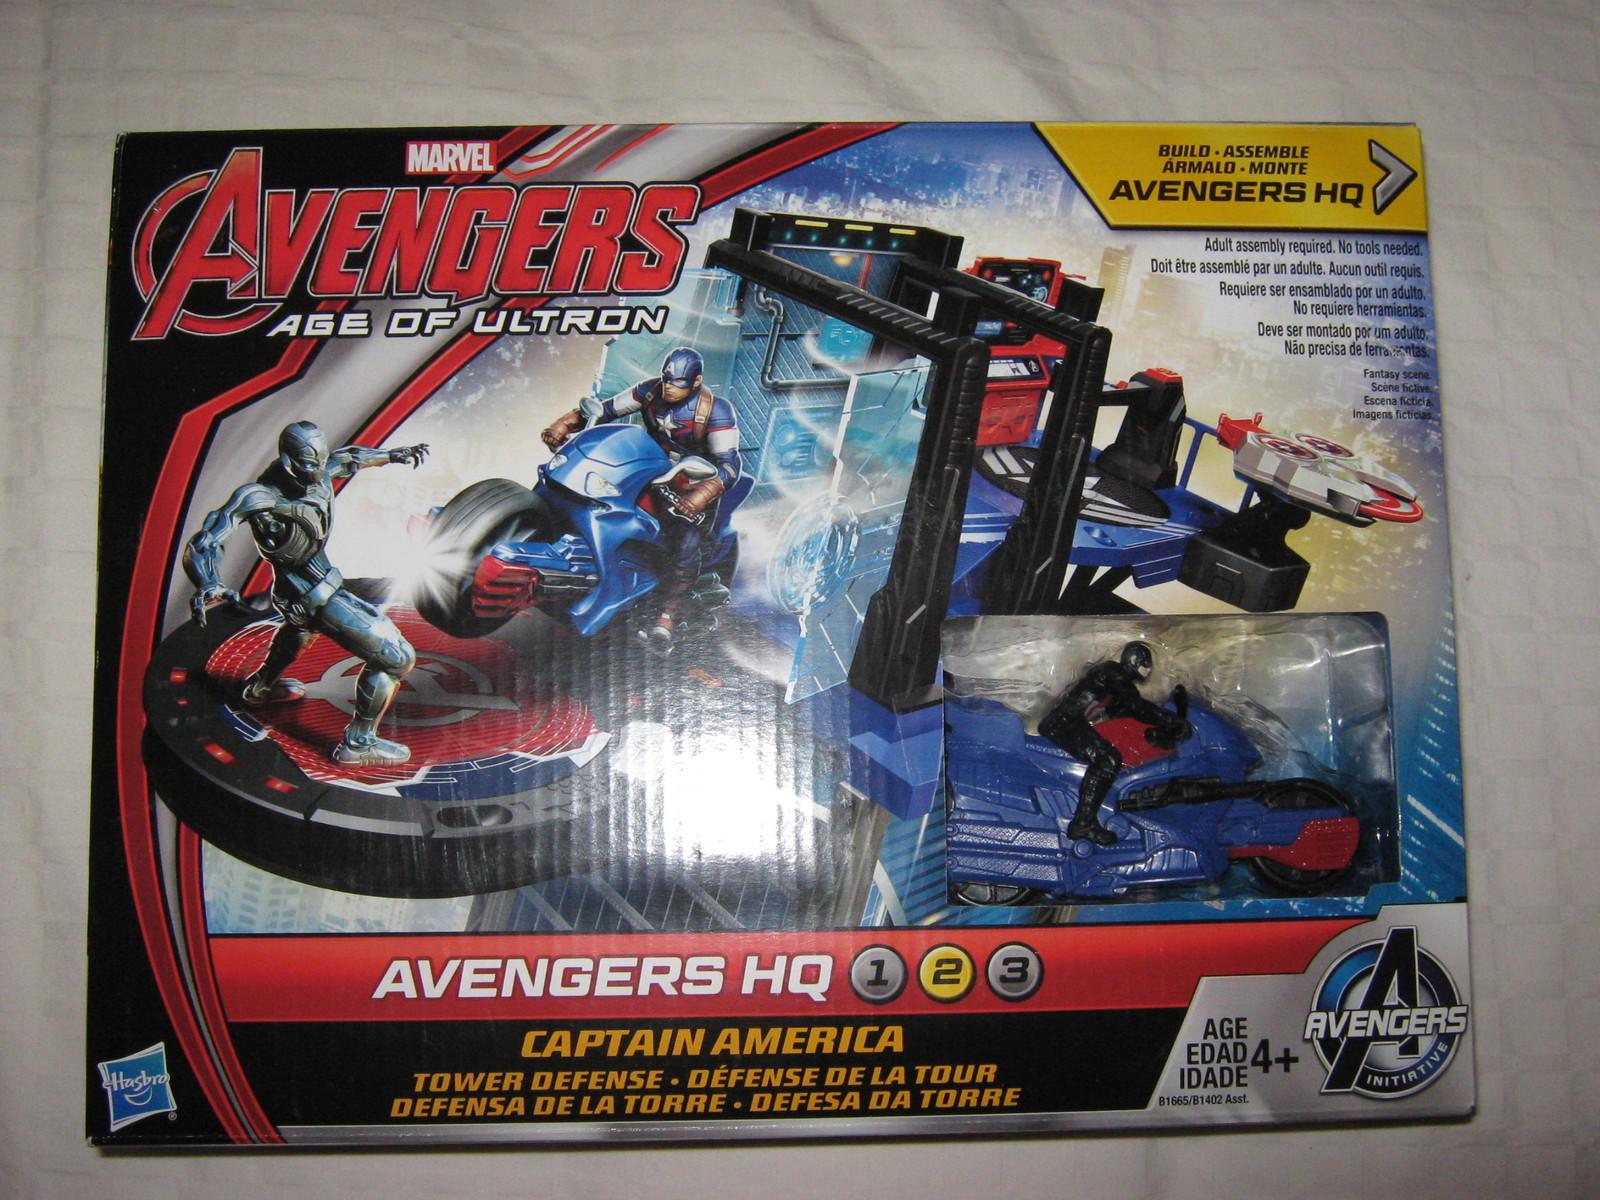 Marvel Heroes Preziosi Coll Complete Set 8 3D Figures Figurines